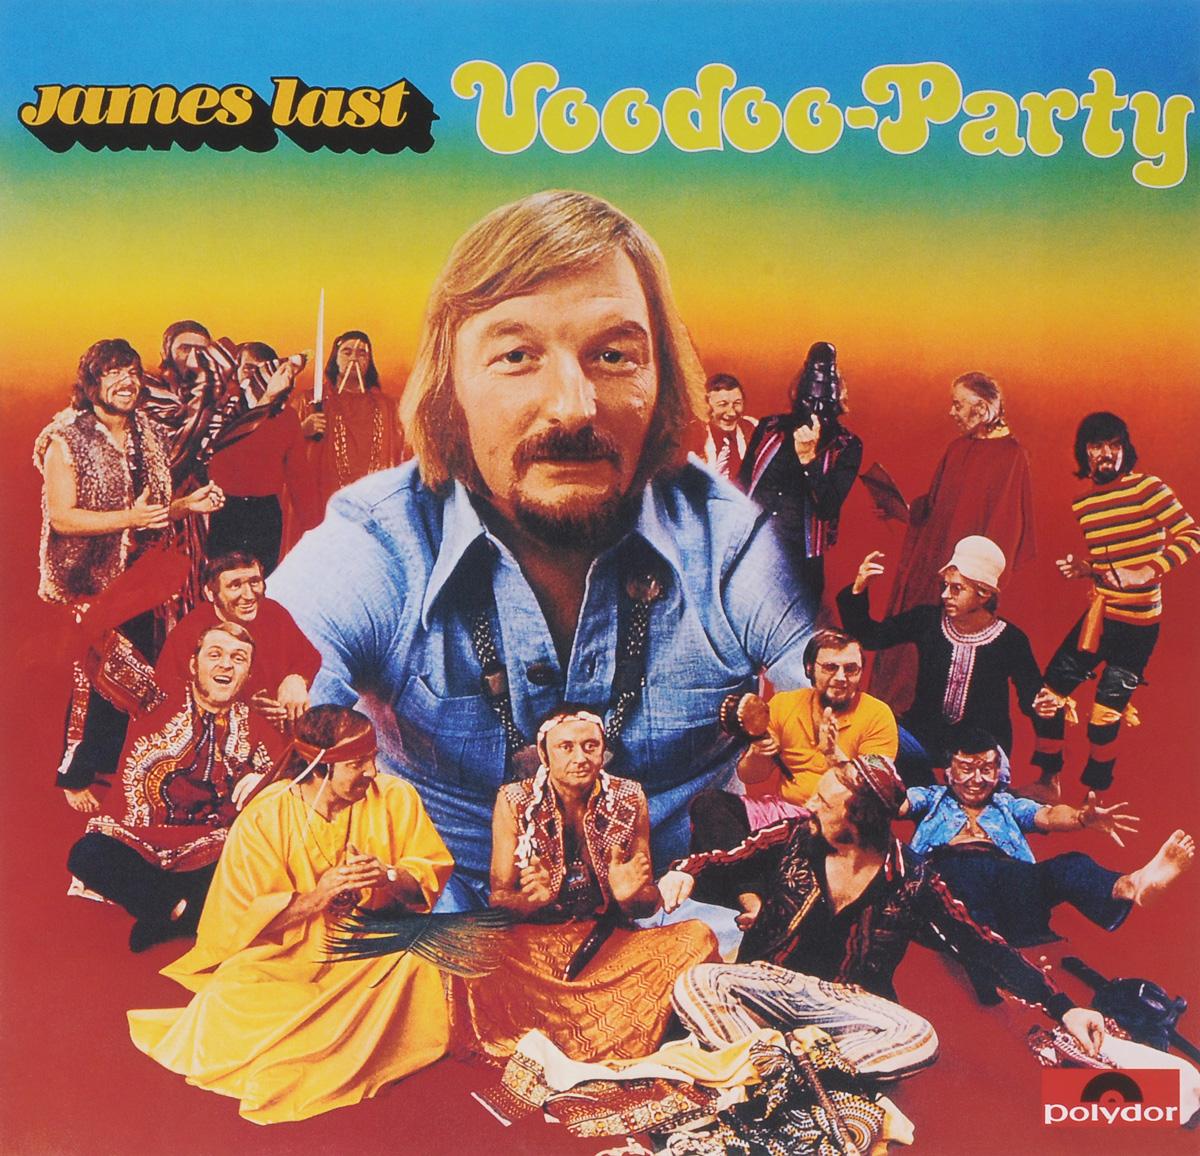 лучшая цена Джеймс Ласт James Last. Voodoo-Party (LP)